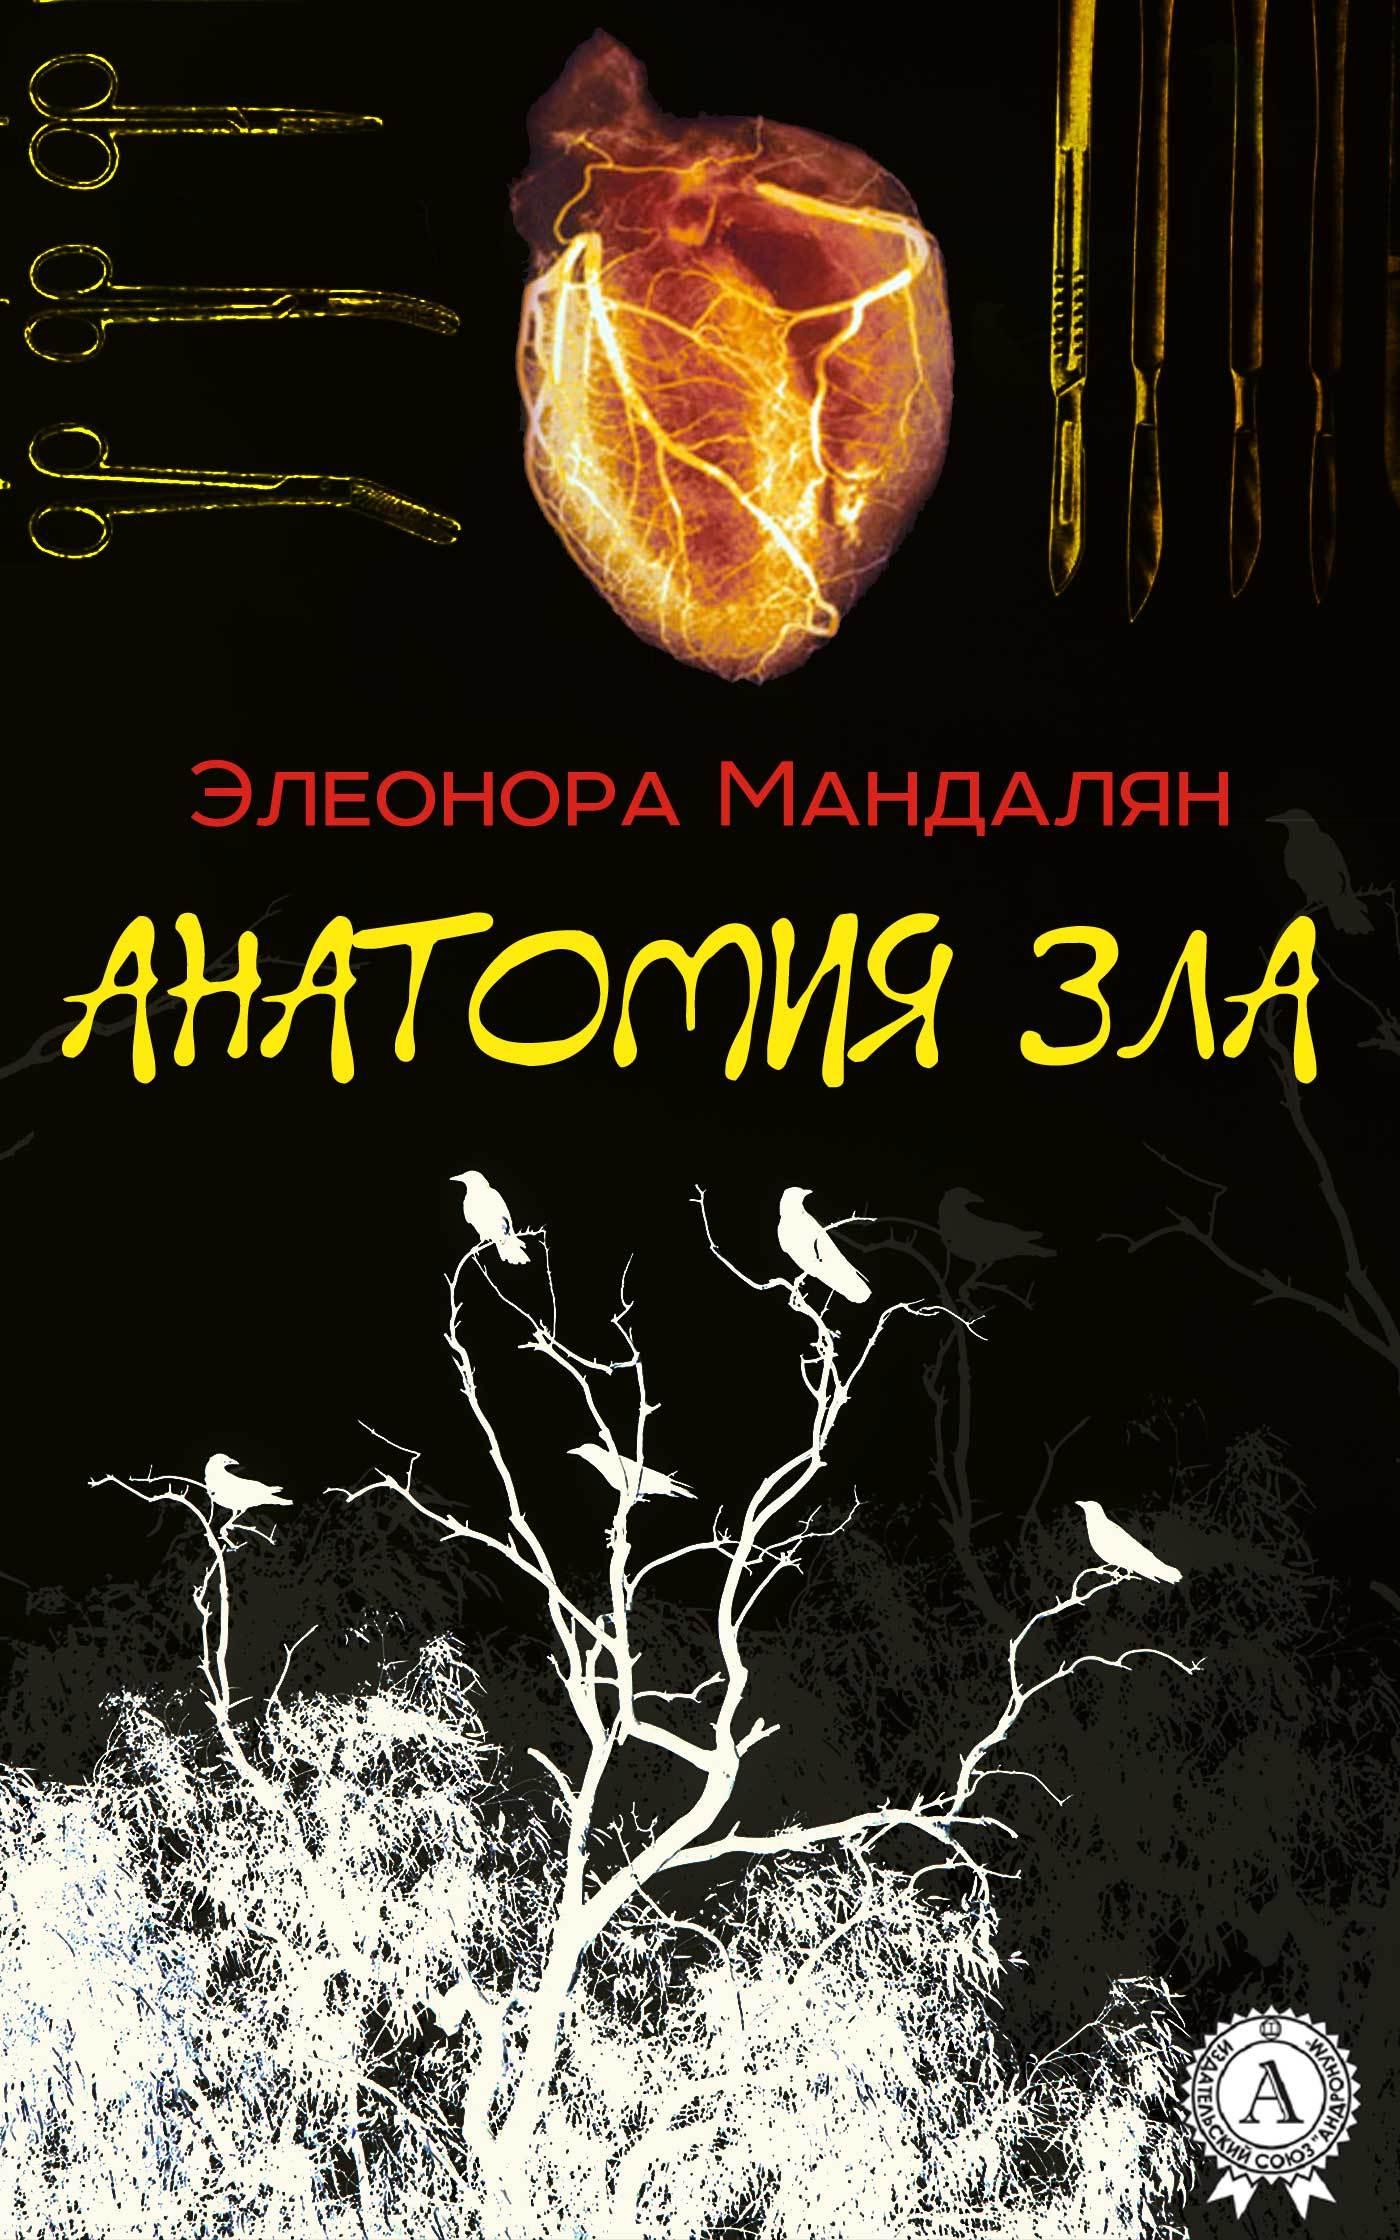 Элеонора Мандалян Анатомия зла запчасти